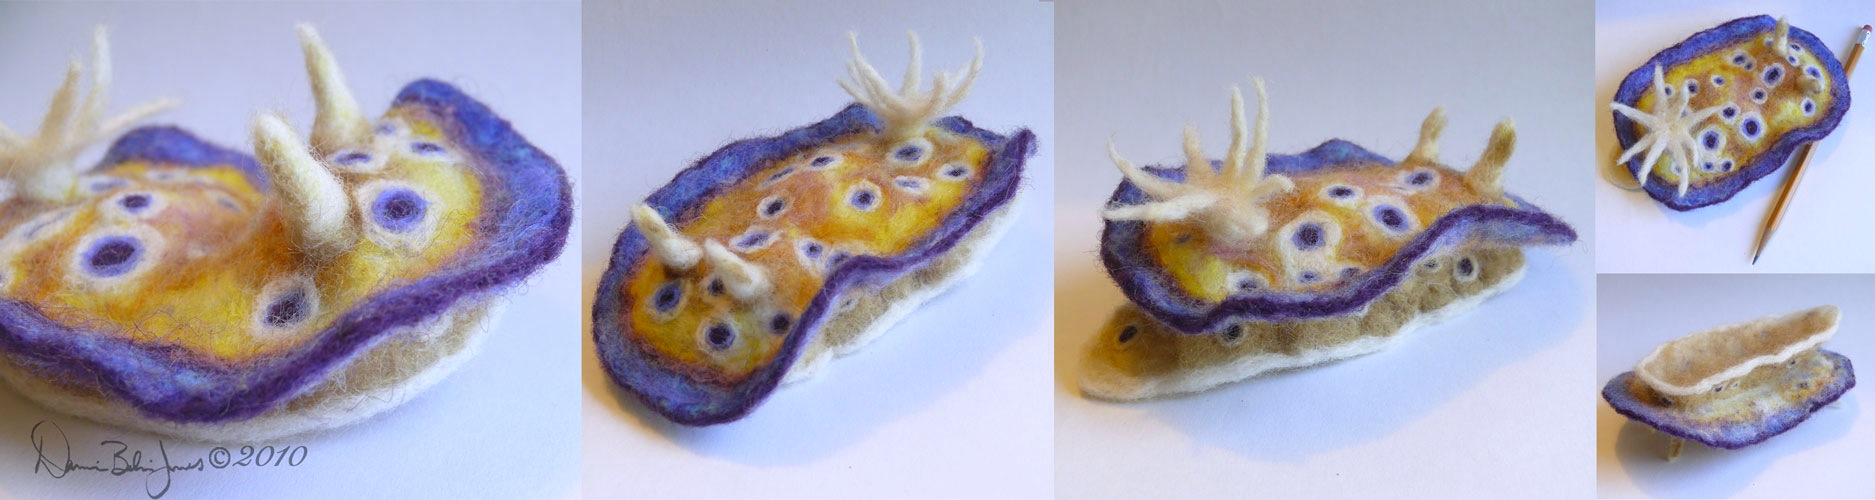 Sea Slug Kuniei by FamiliarOddlings